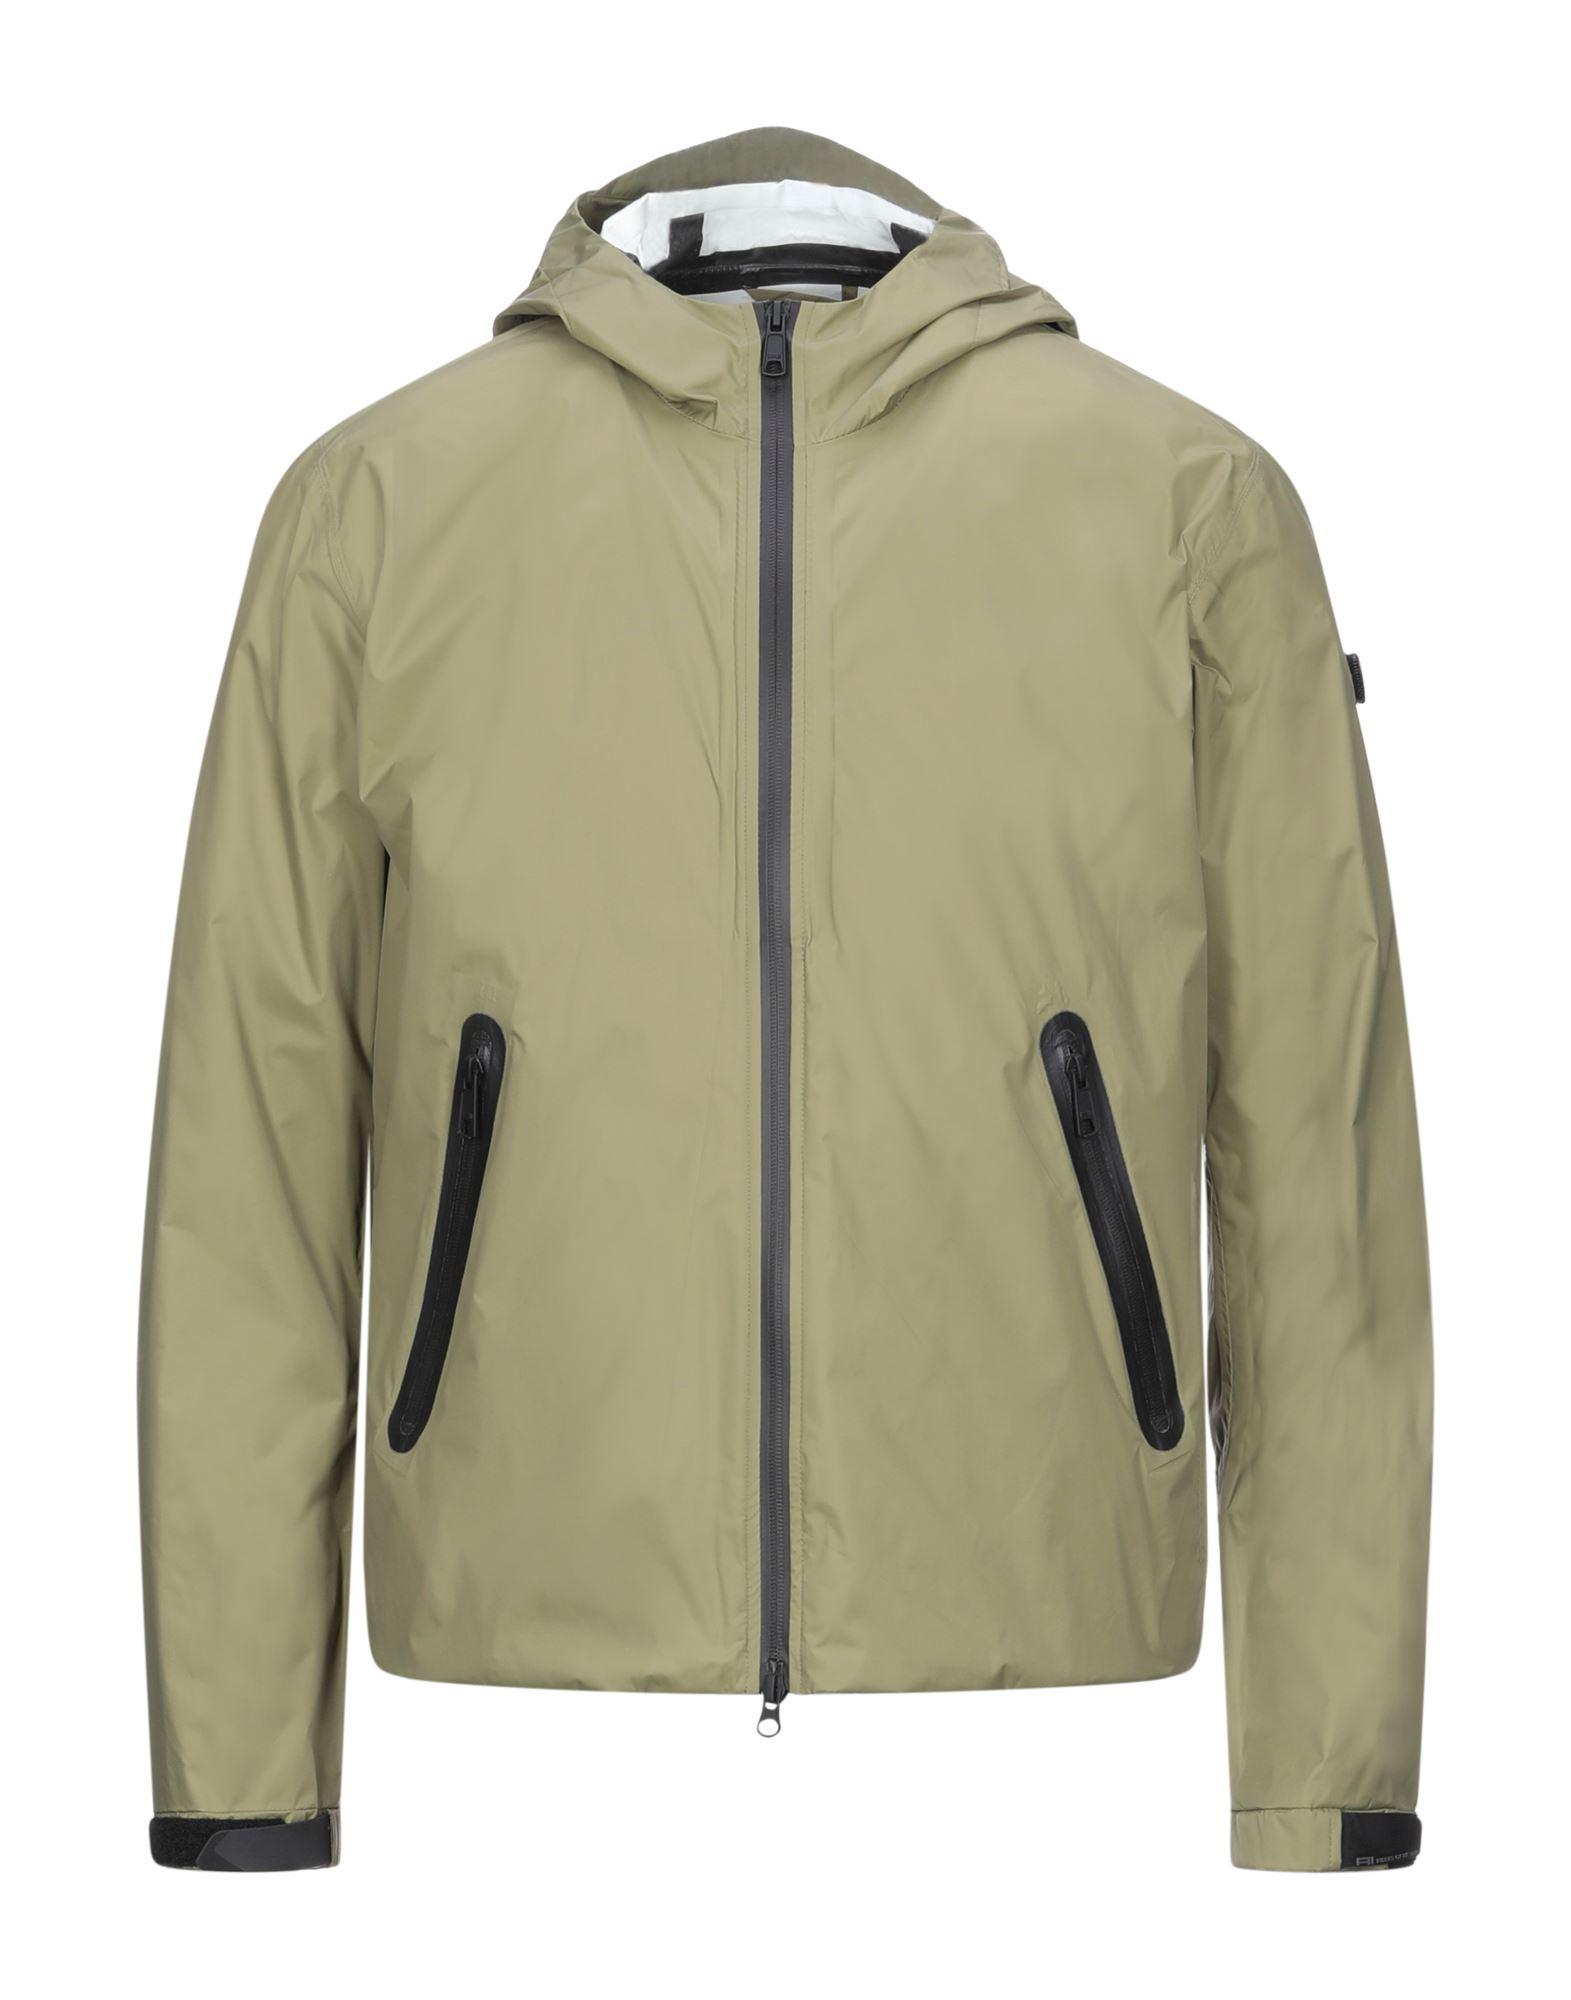 Фото - AI RIDERS ON THE STORM Куртка куртка ai riders jg364gtmr4 размер 164 фиолетовый